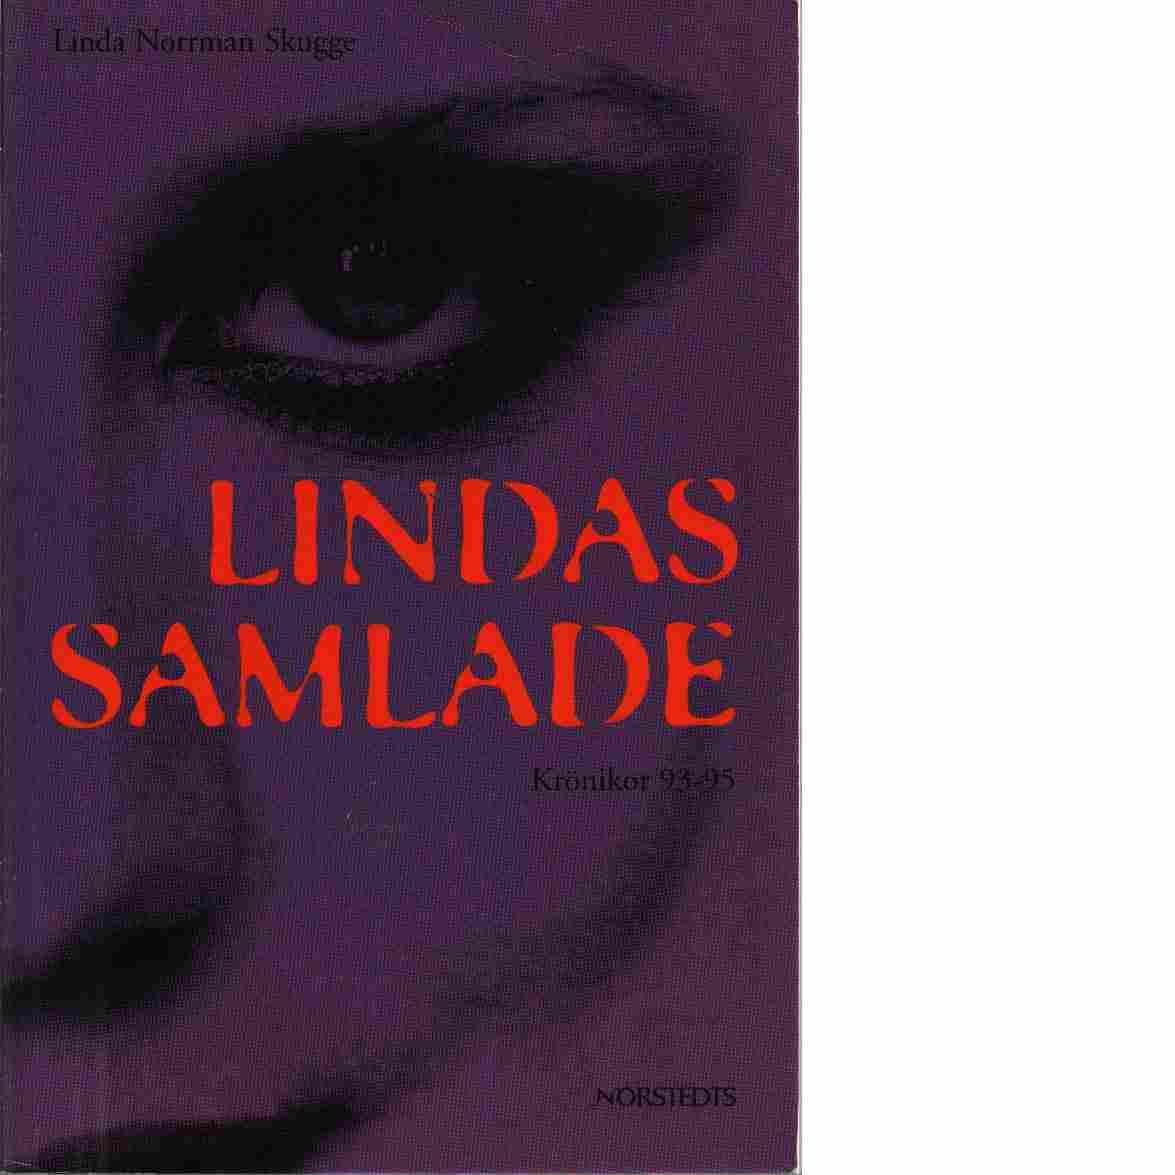 Lindas samlade : krönikor 1993-1995 - Skugge, Linda